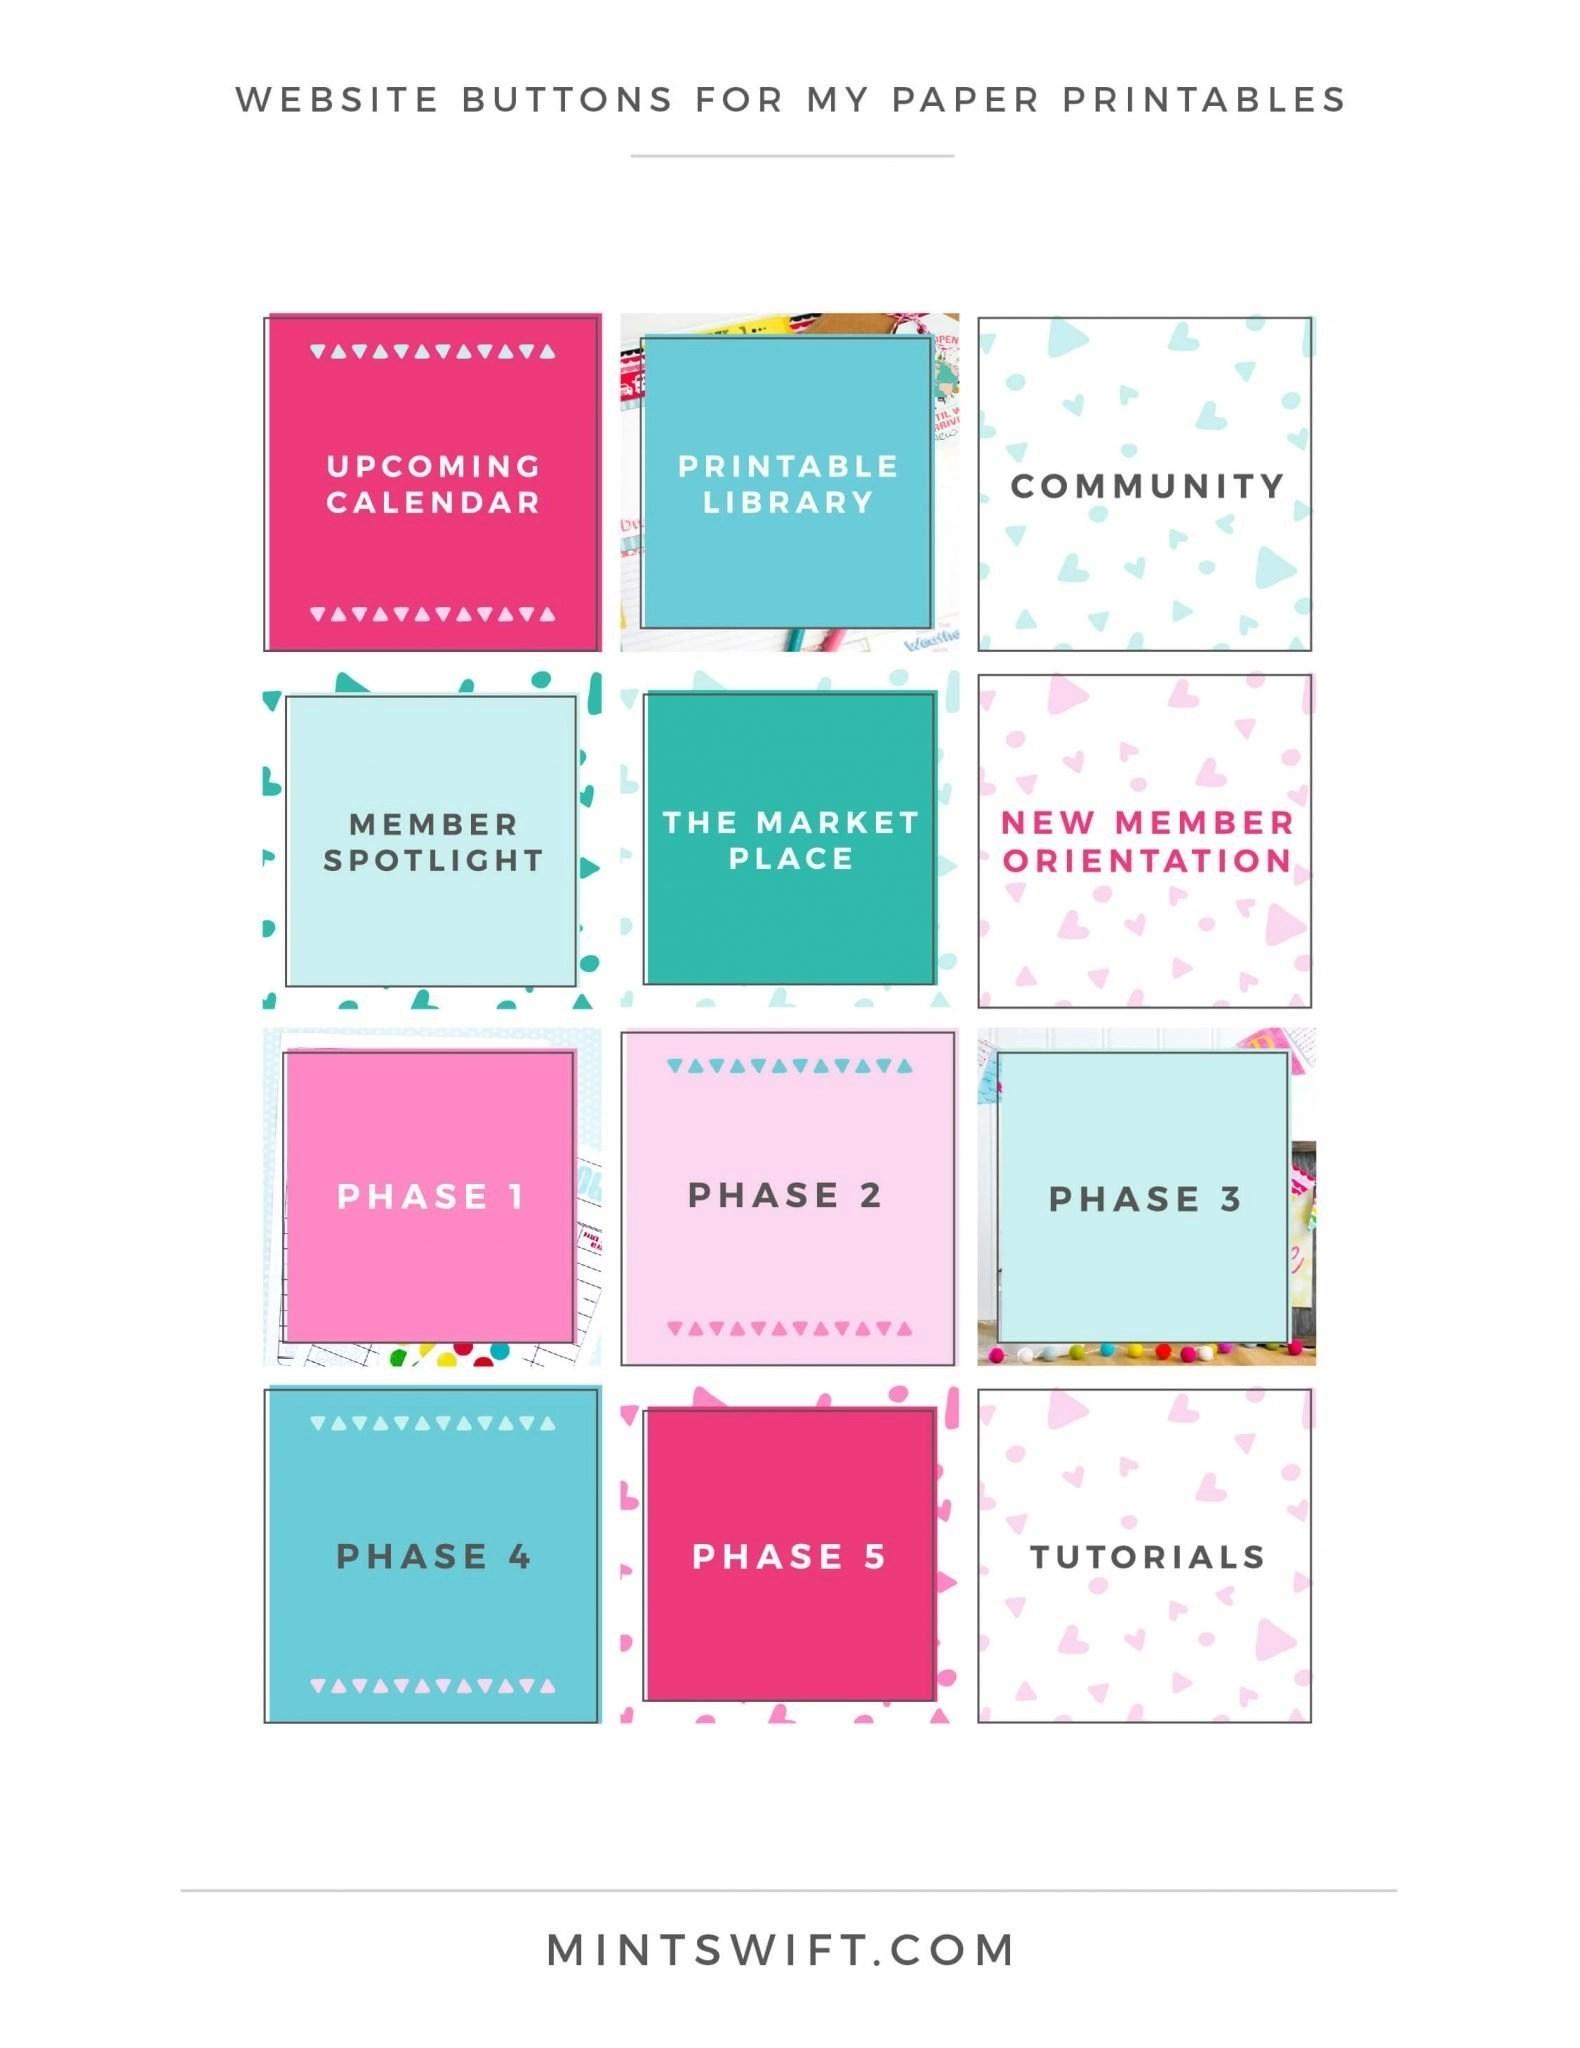 My Paper Printables - Website Buttons - Brand Design - MintSwift